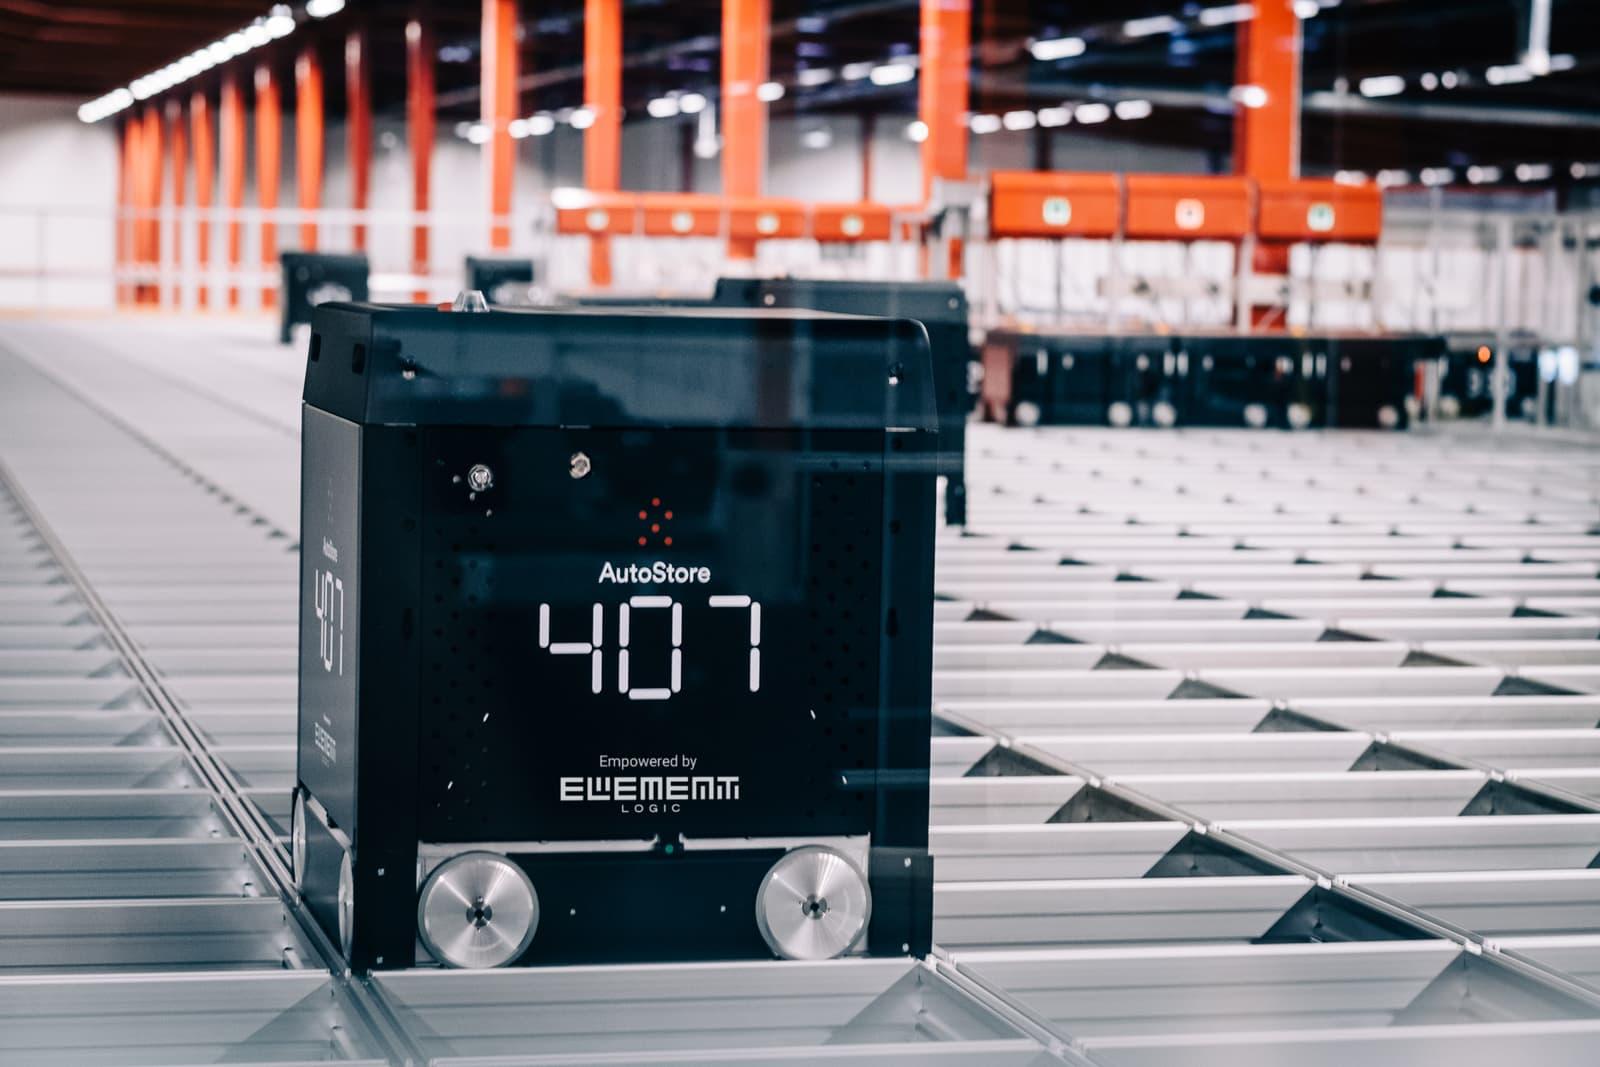 AutoStore Black line B1 warehouse robot